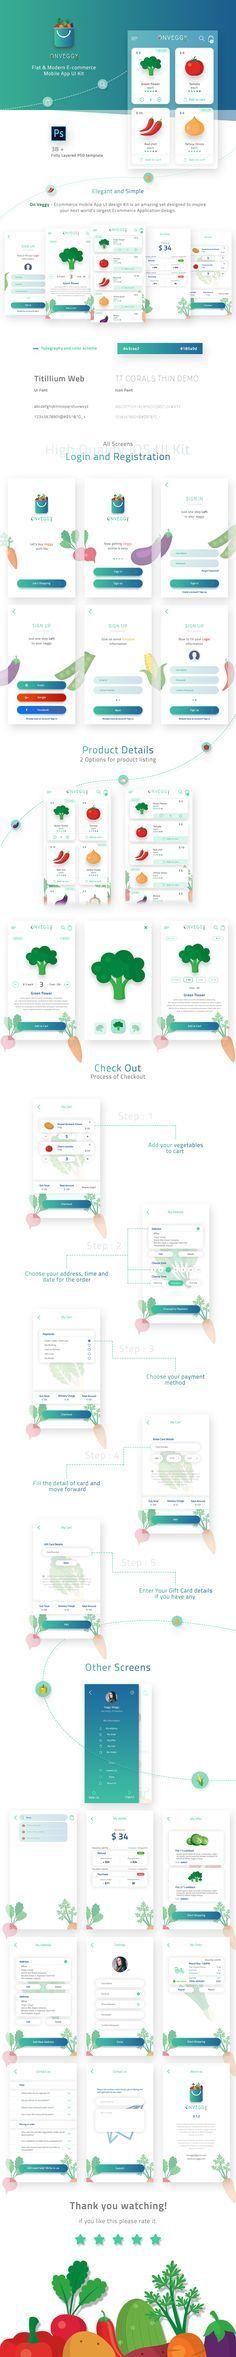 Ознакомьтесь с этим проектом @Behance: «On Veggy - Multipurpose E-commerce App UI Kit» https://www.behance.net/gallery/52192577/On-Veggy-Multipurpose-E-commerce-App-UI-Kit